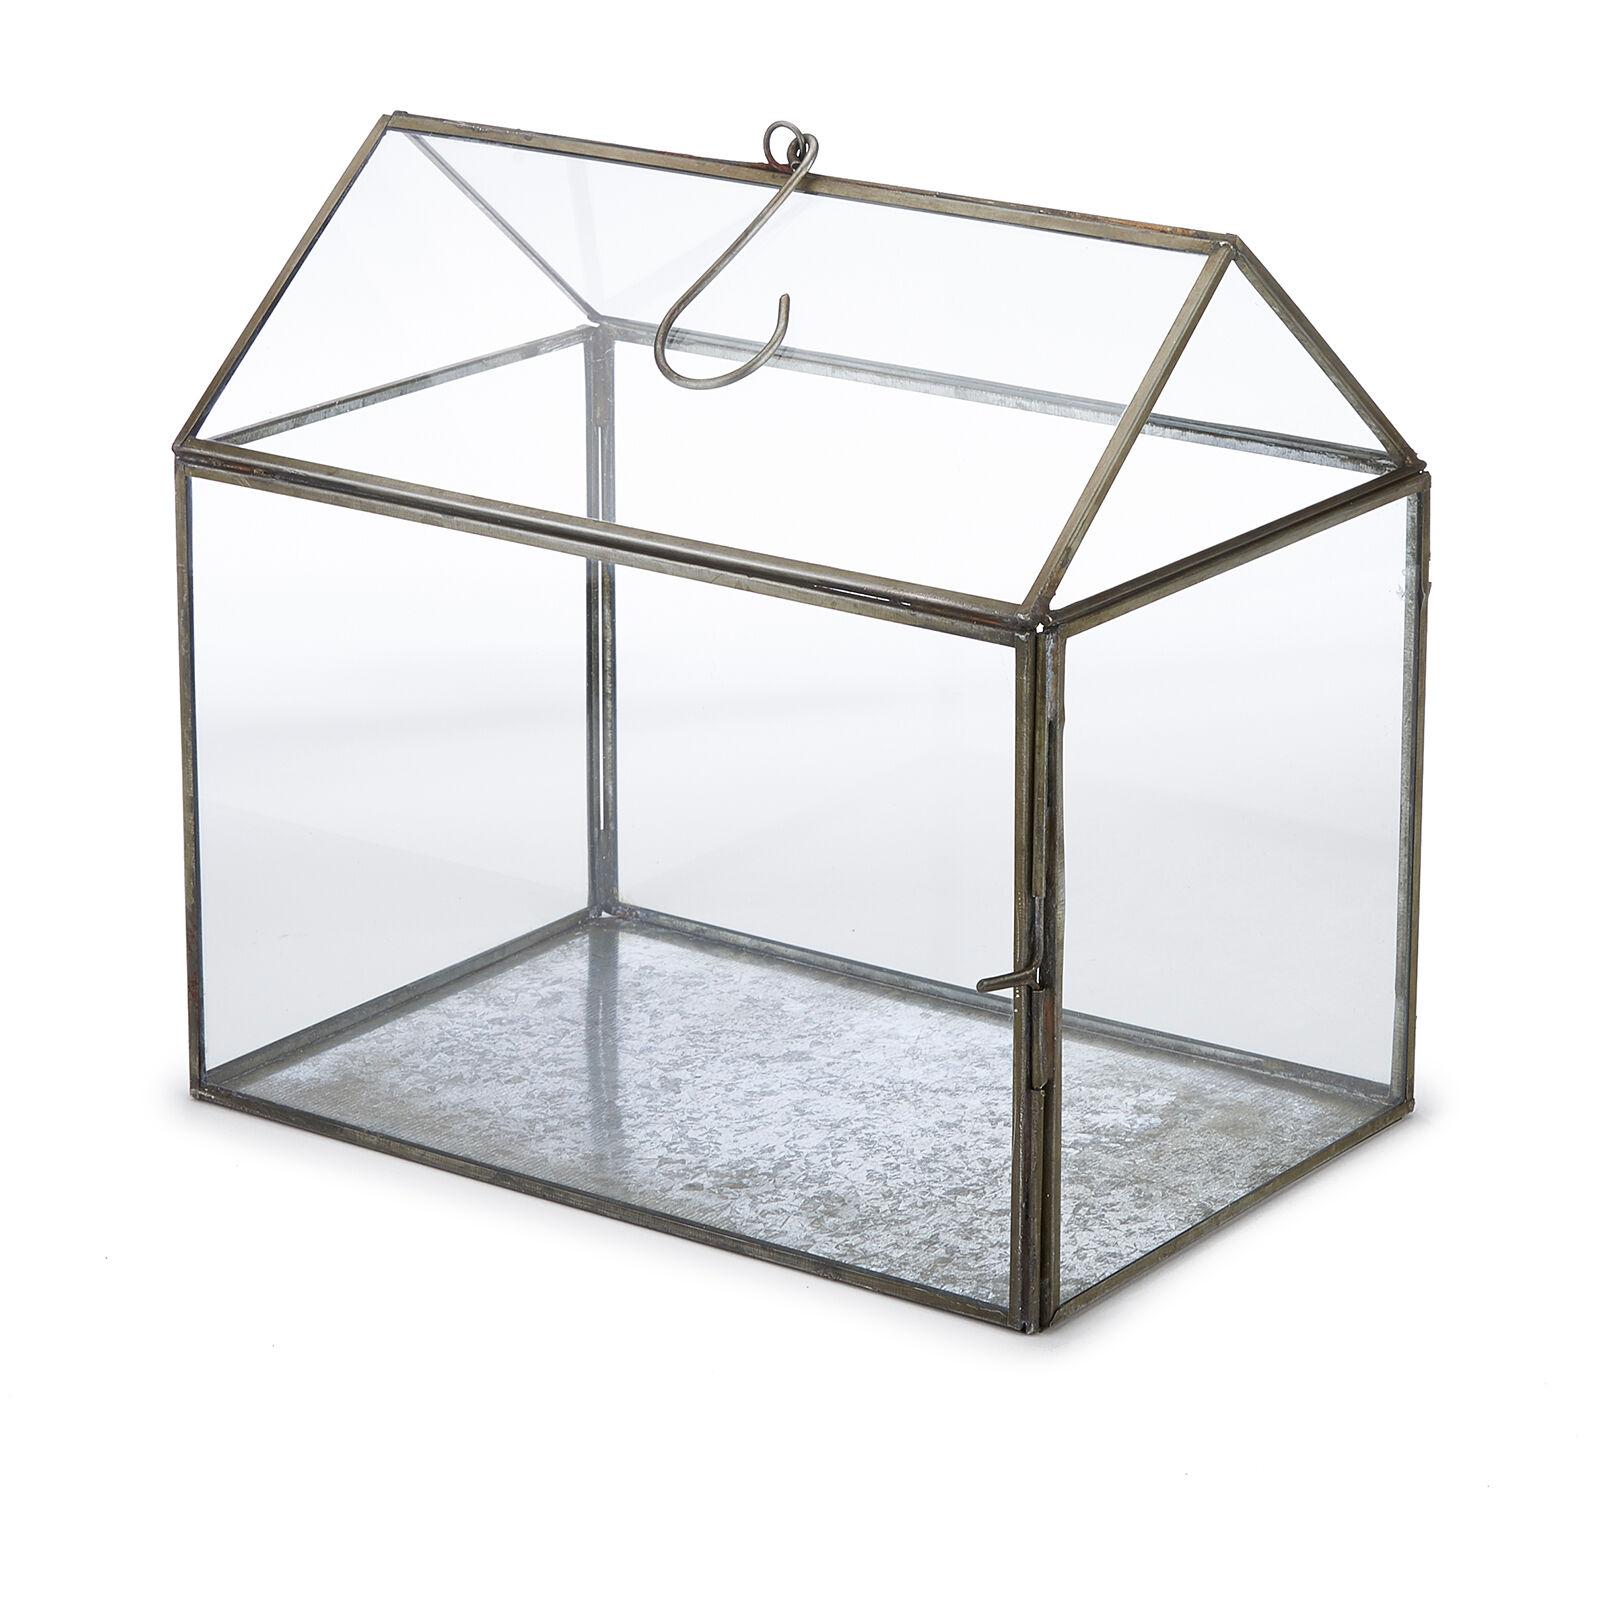 Nkuku Miro Greenhouse - Antique Zinc - Small